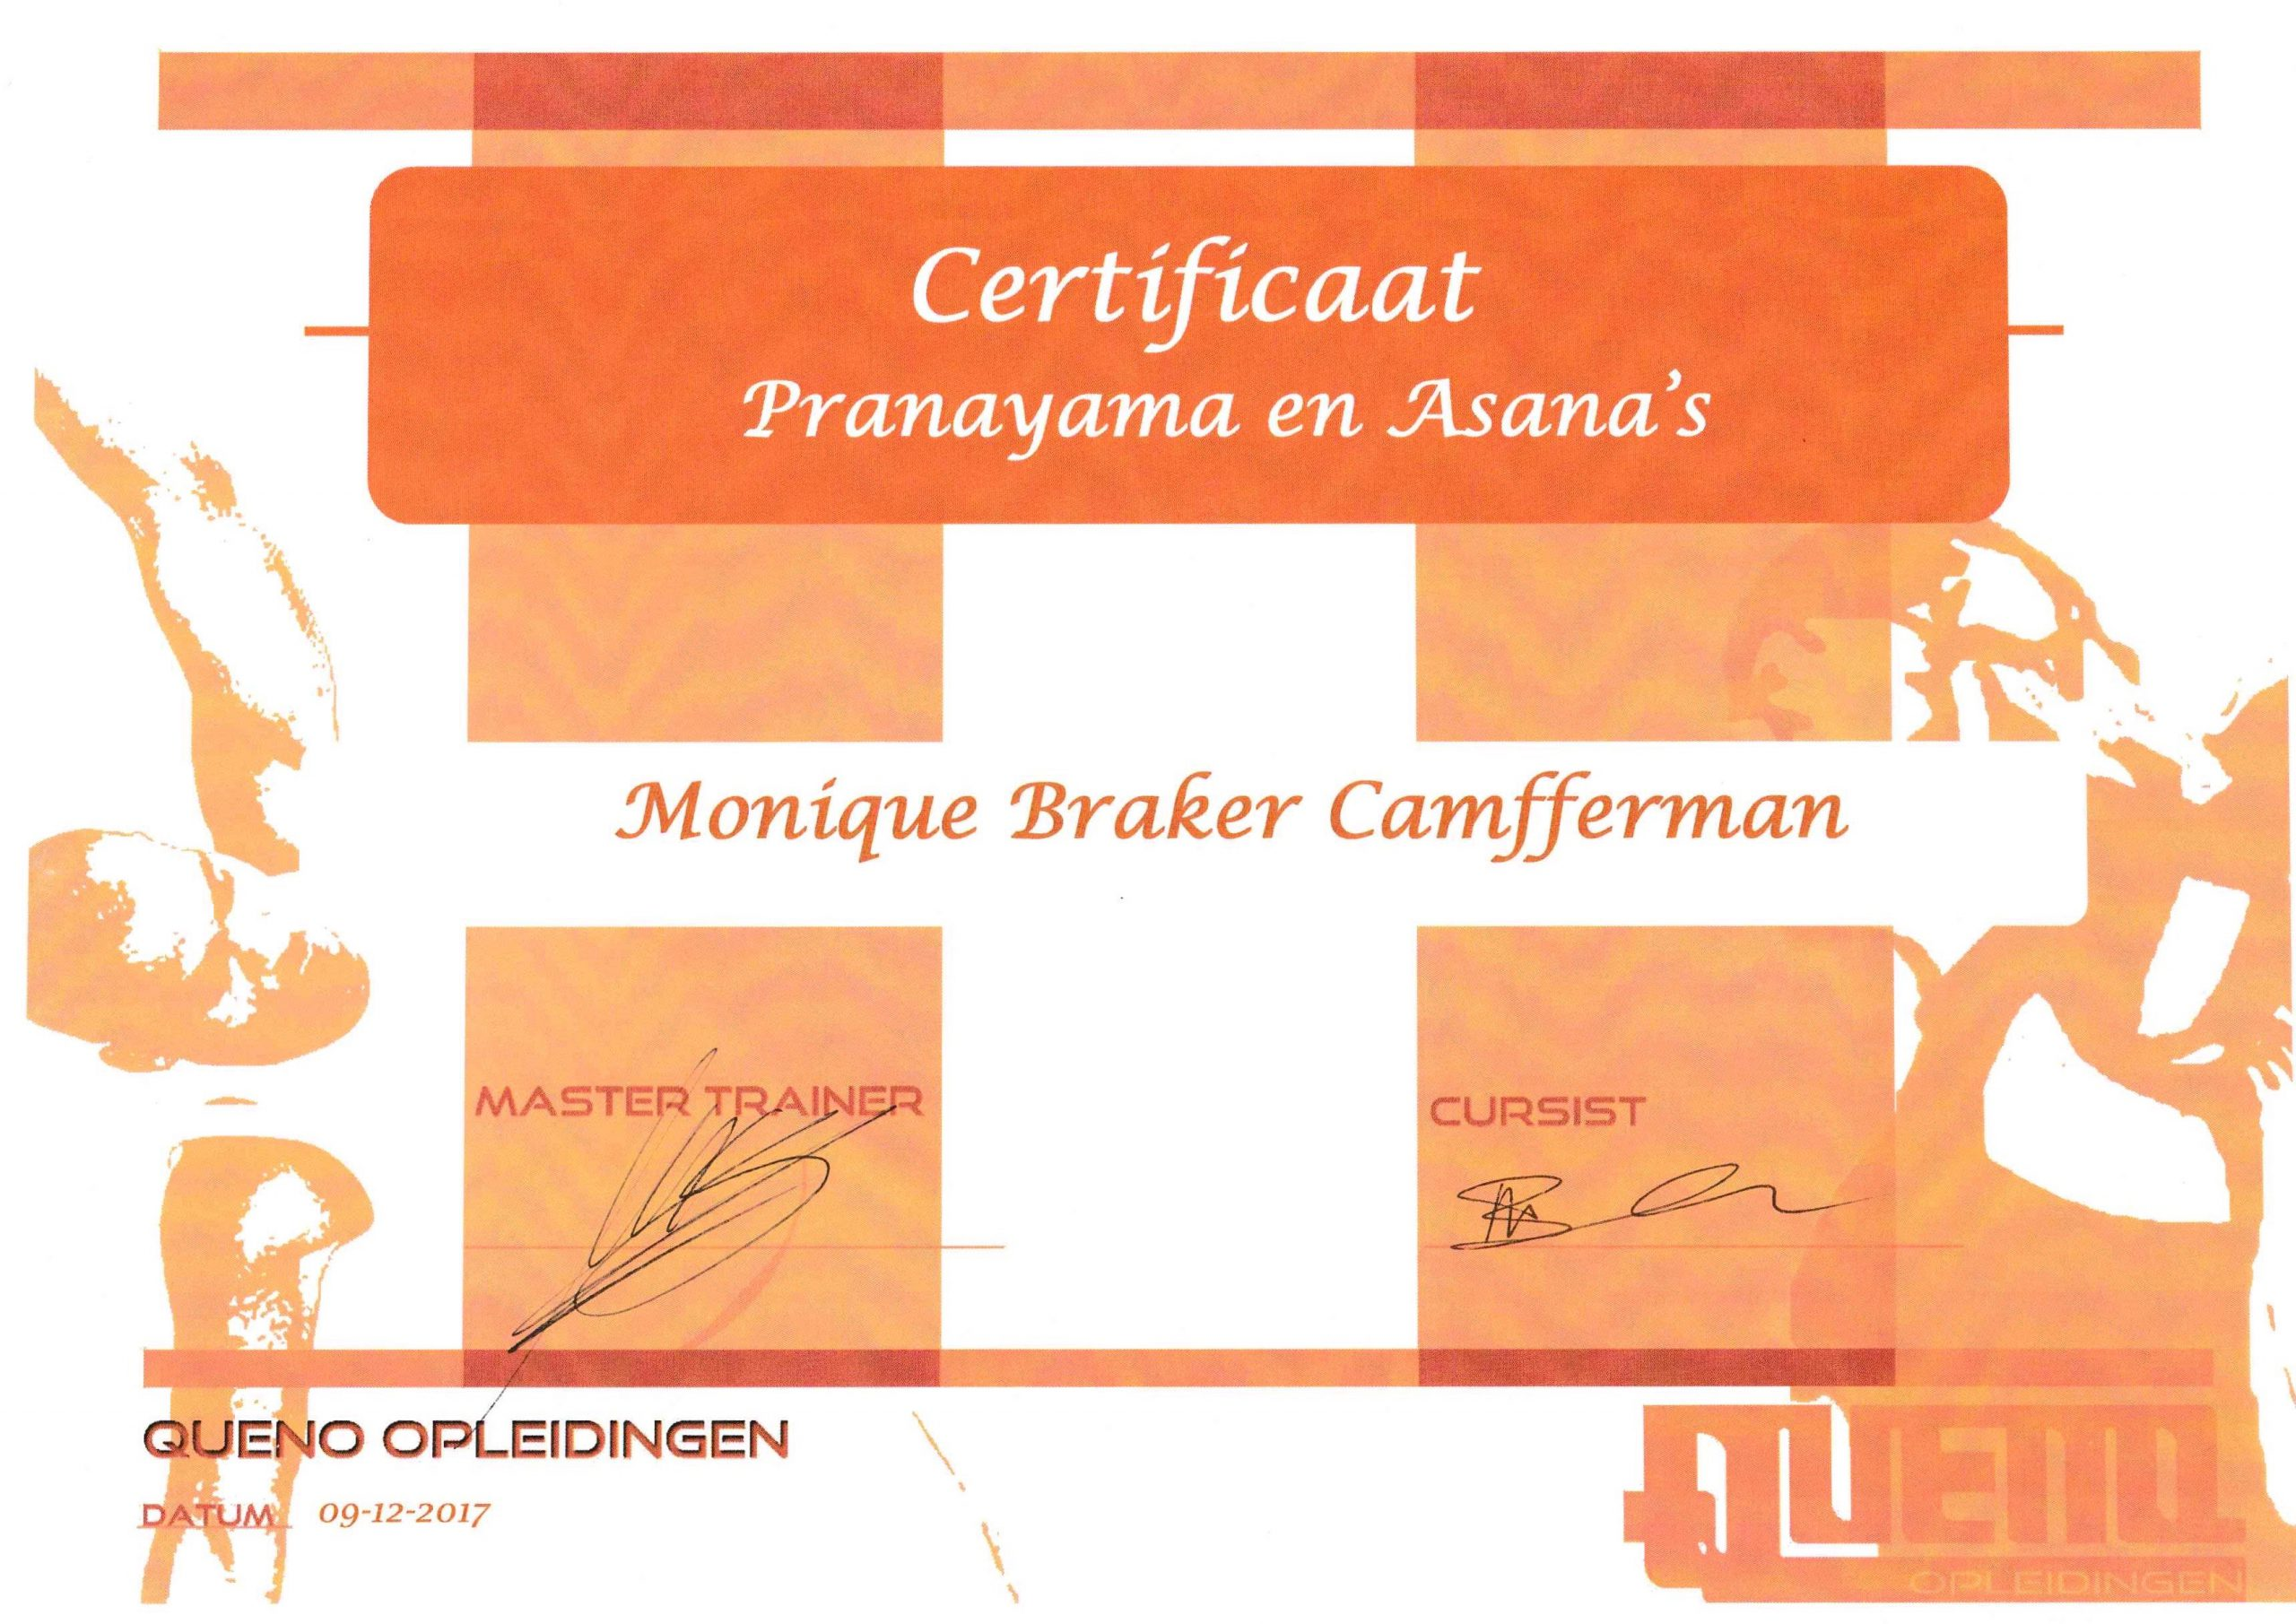 Certificaat Pranayama en Asana's